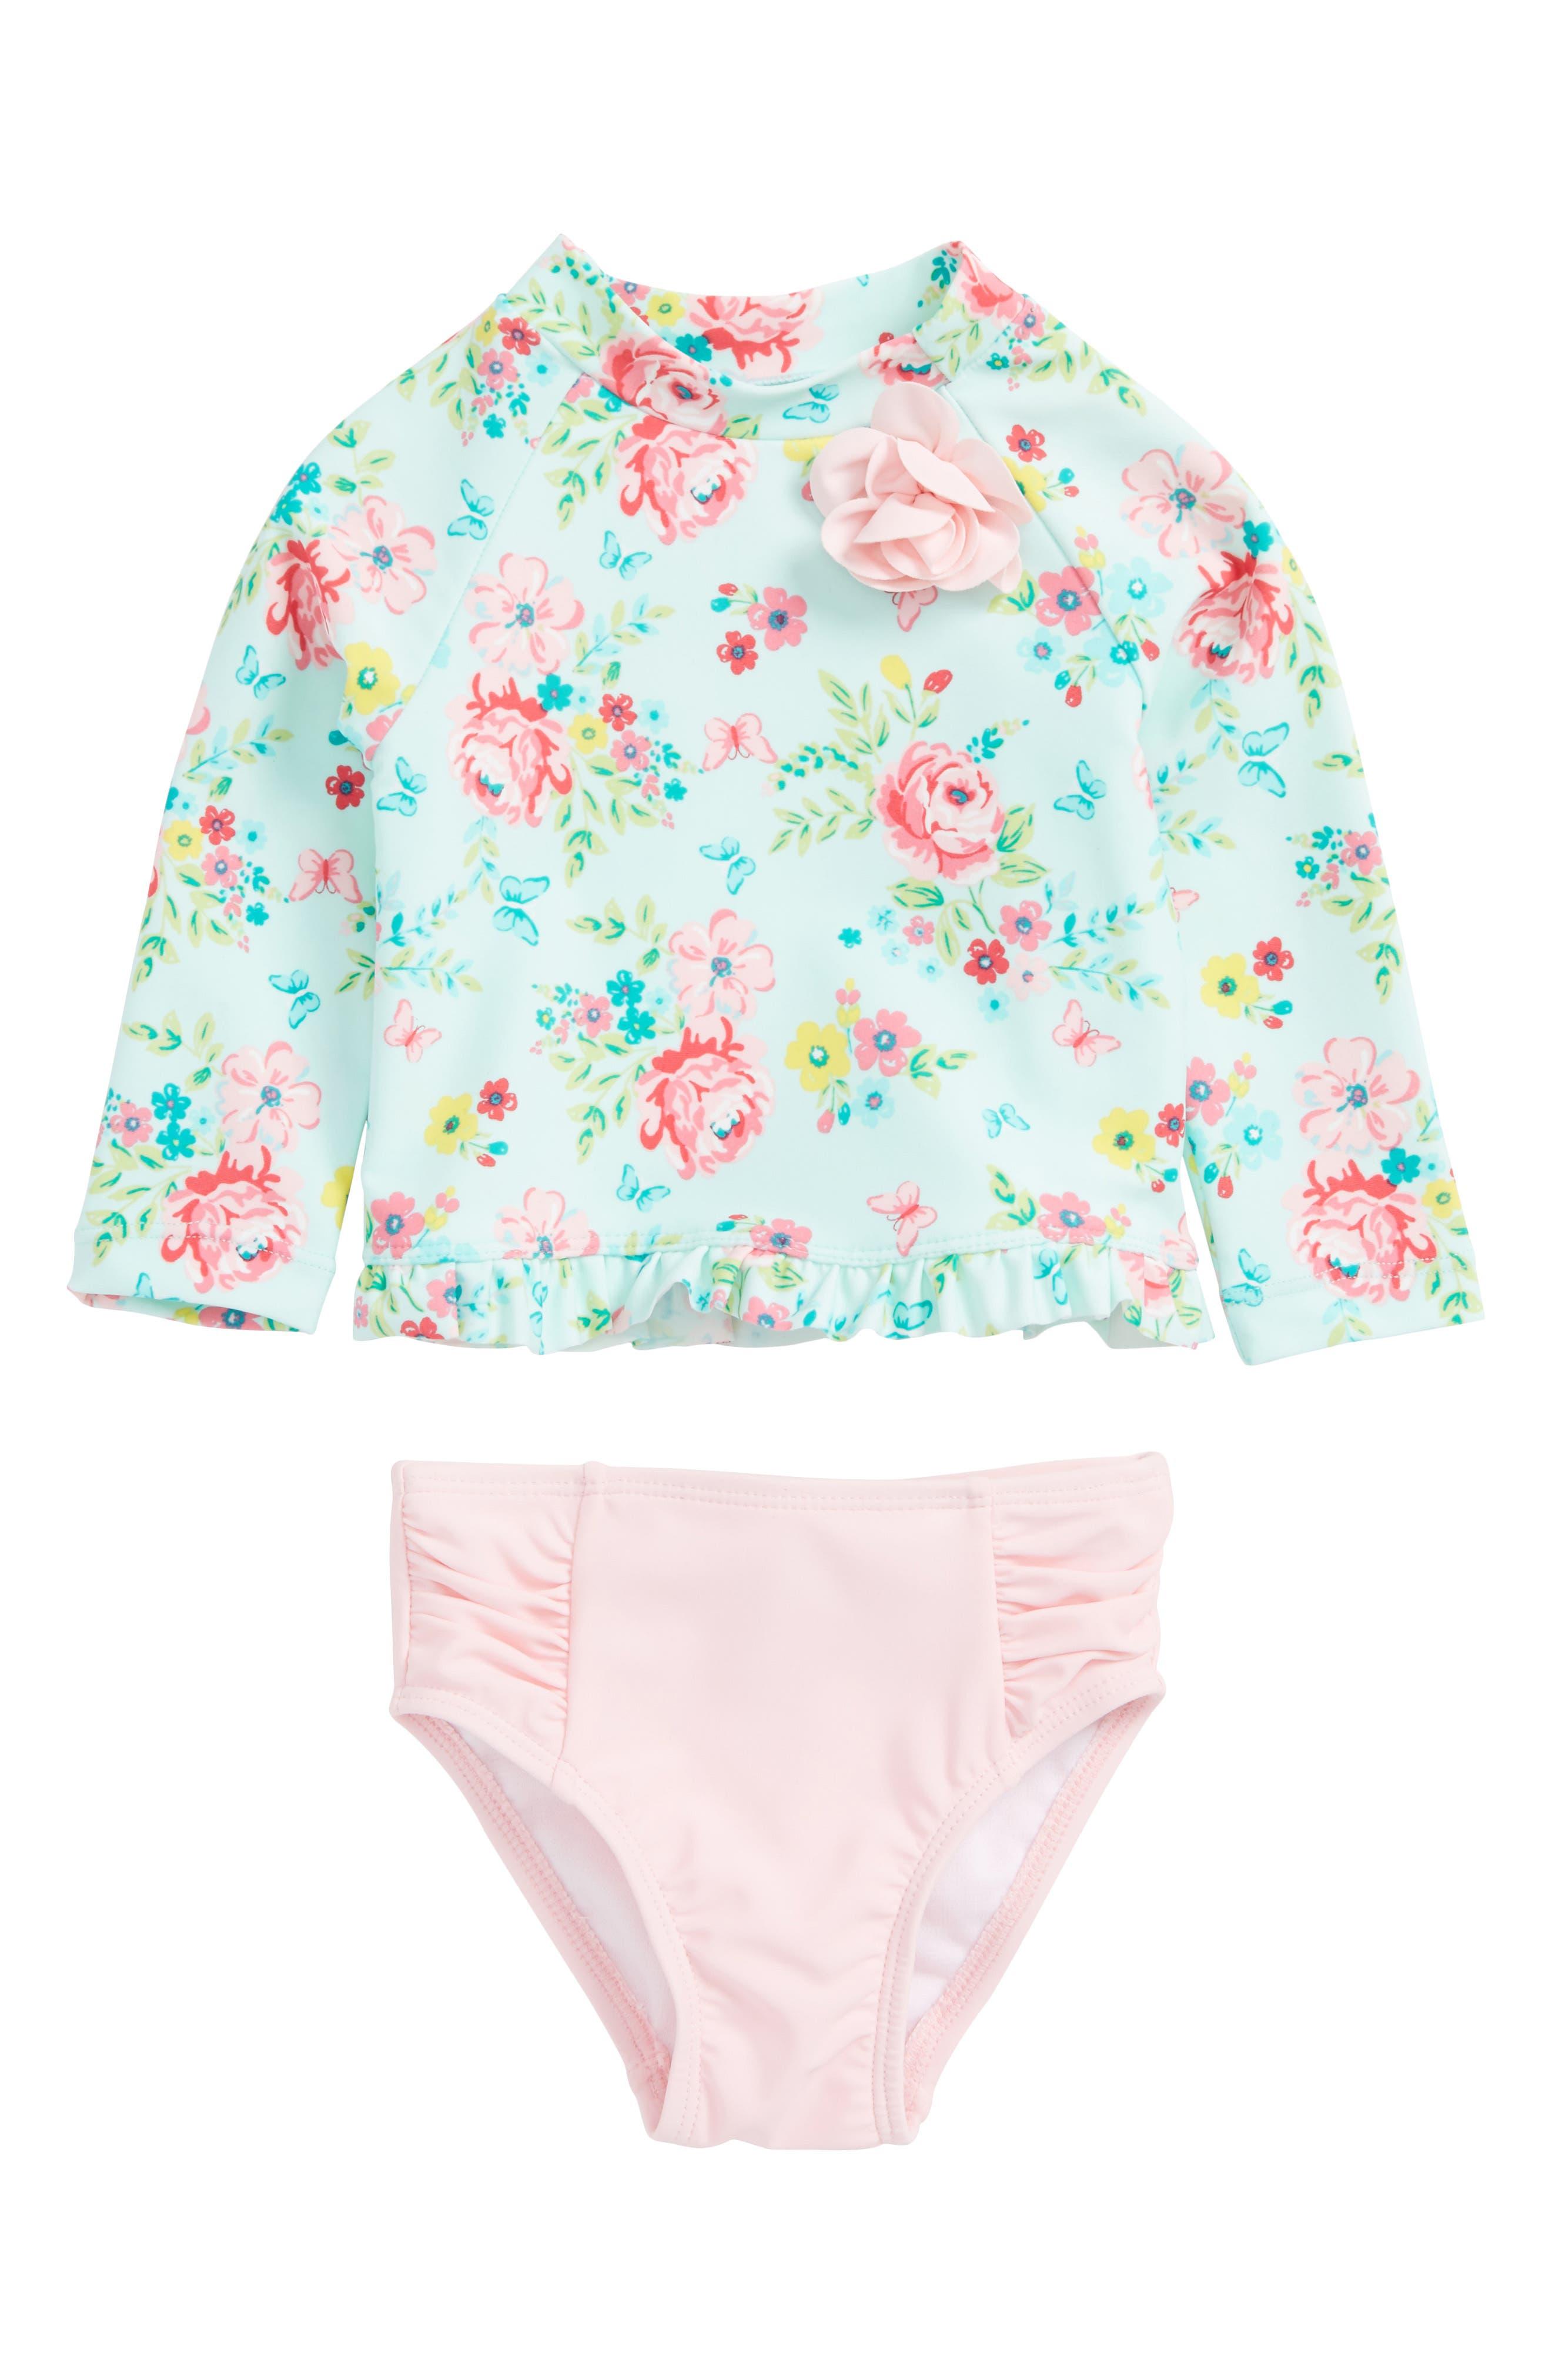 Main Image - Little Me Aqua Rose Two-Piece Rashguard Swimsuit (Baby Girls)